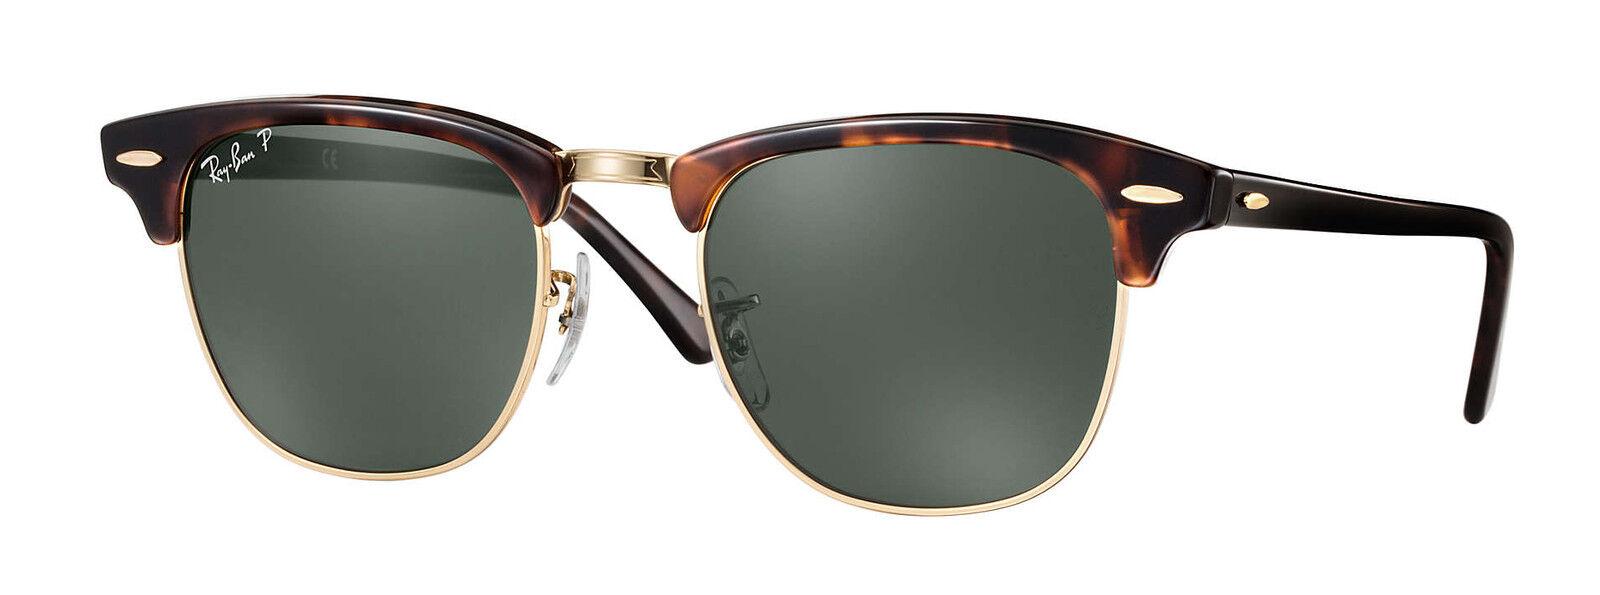 673f73e728d41 Ray-Ban Clubmaster RB3016-990 58 Havana 49mm Polarized Sunglasses   eBay